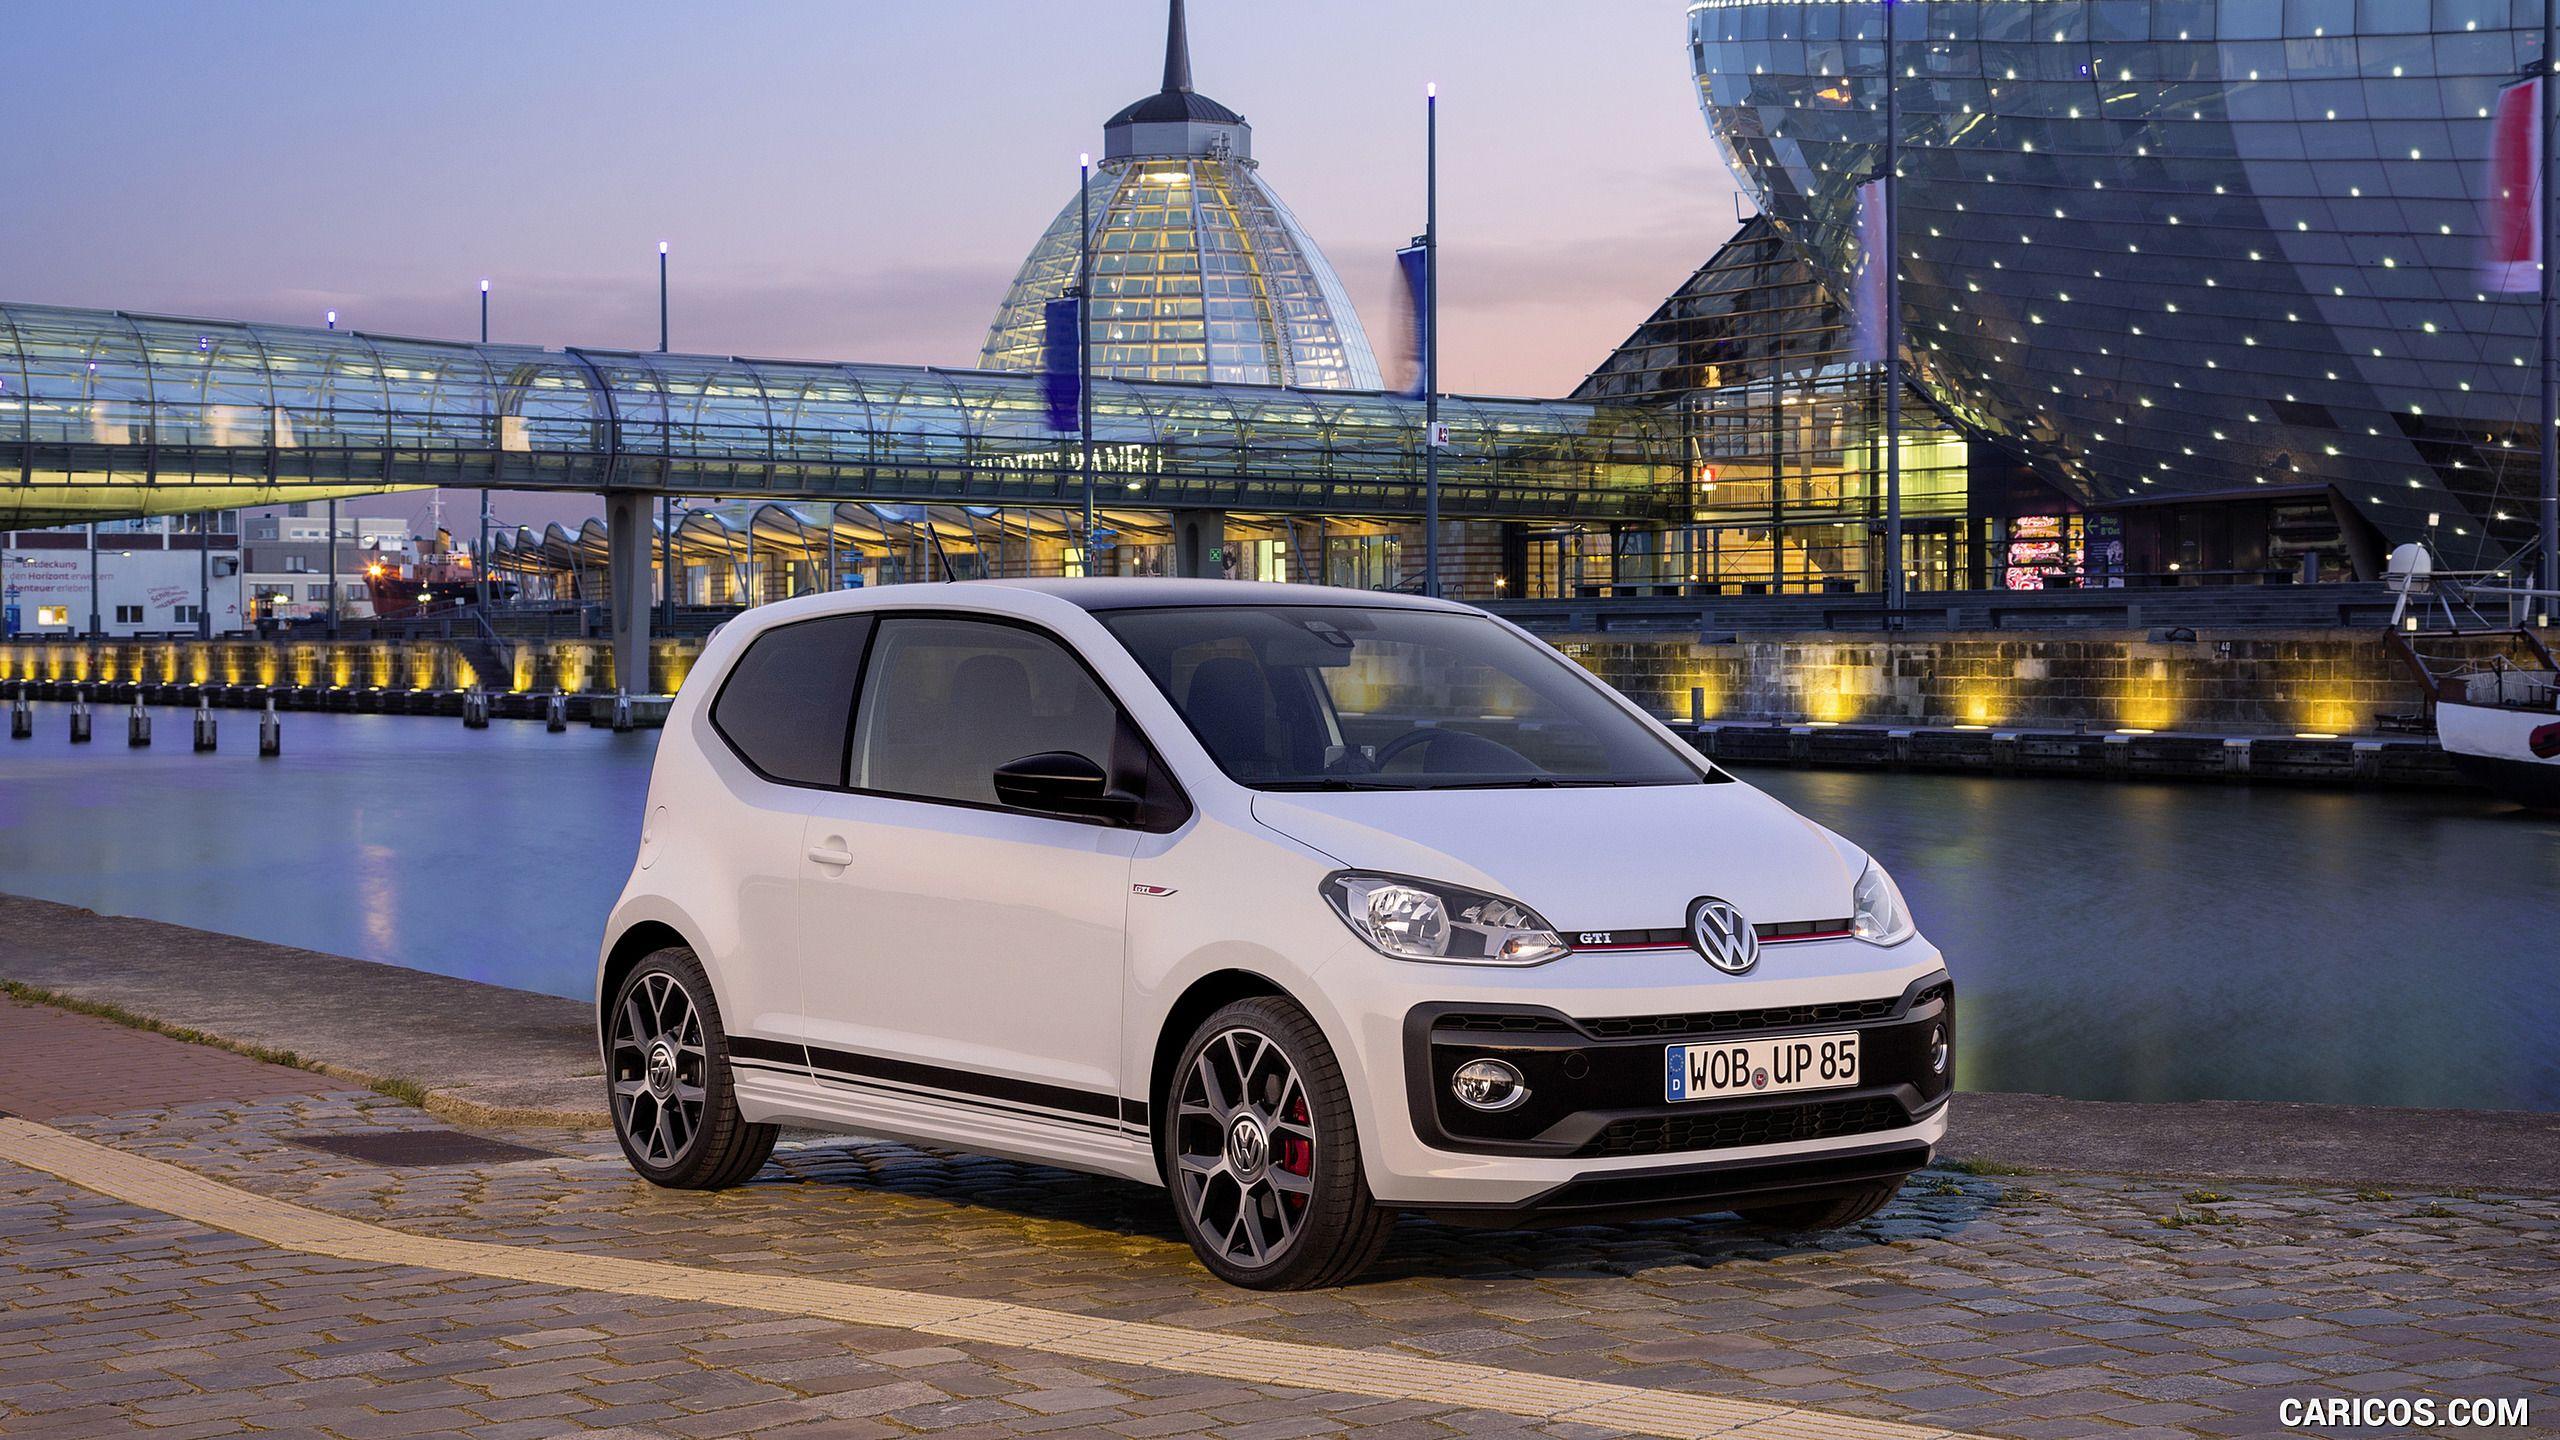 2018 Volkswagen Up Gti Vw Up Volkswagen Up Volkswagen